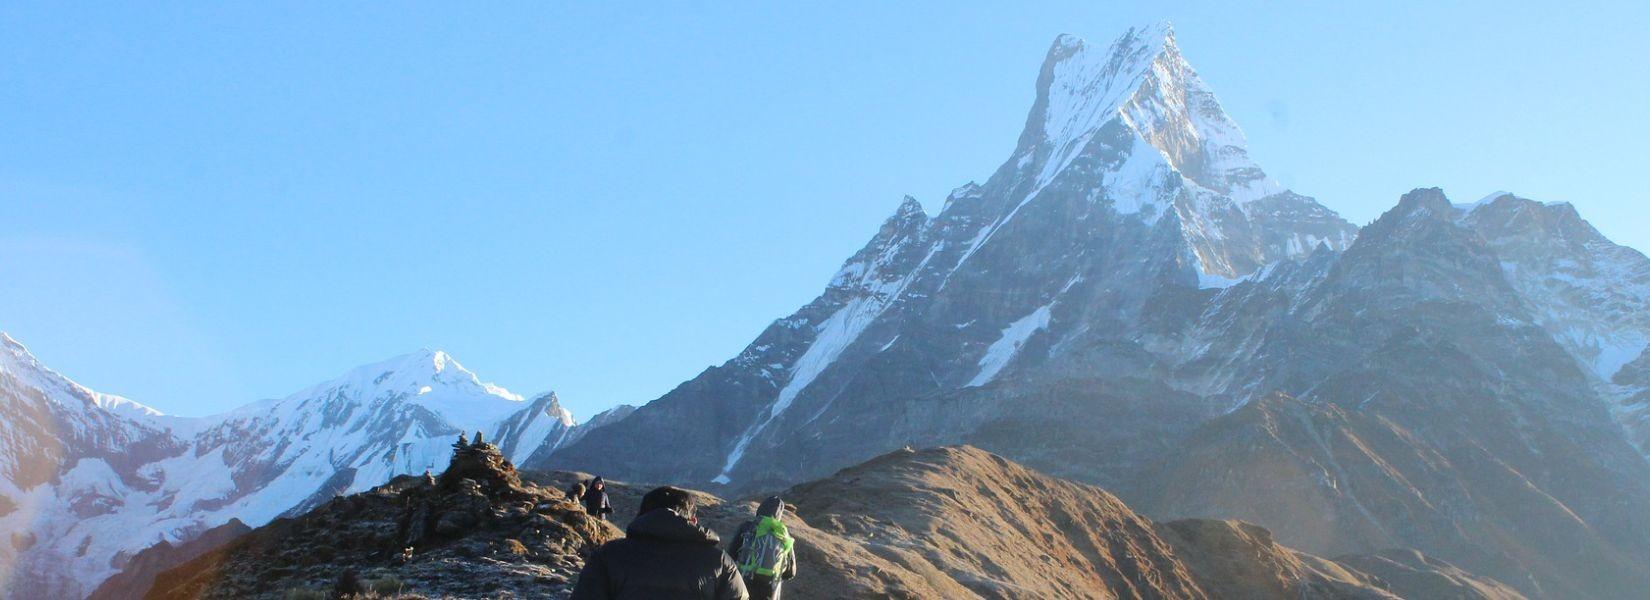 trekking in nepal on budget